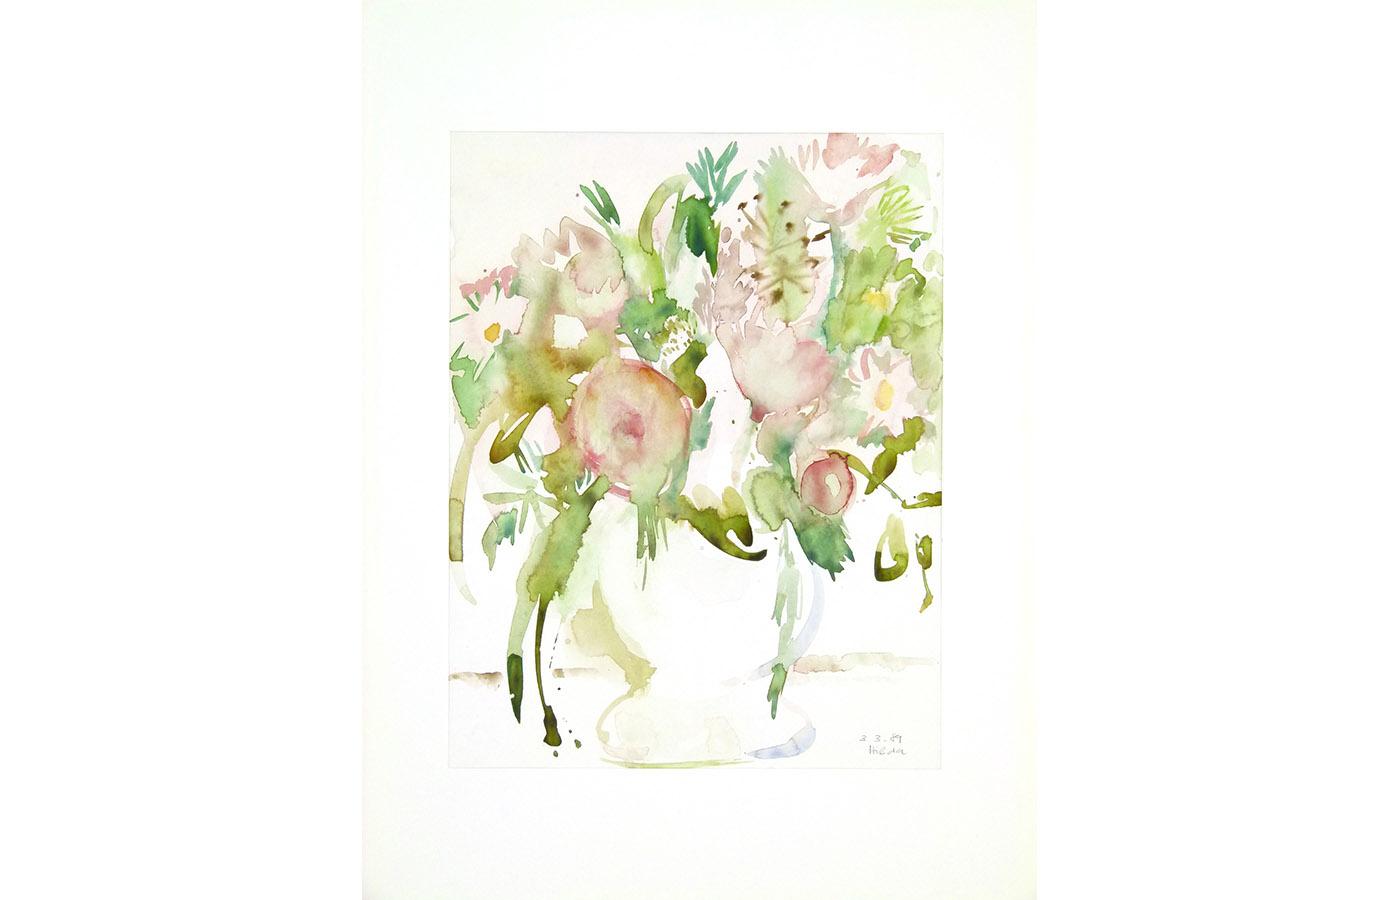 Blumen_0048_L1100376a